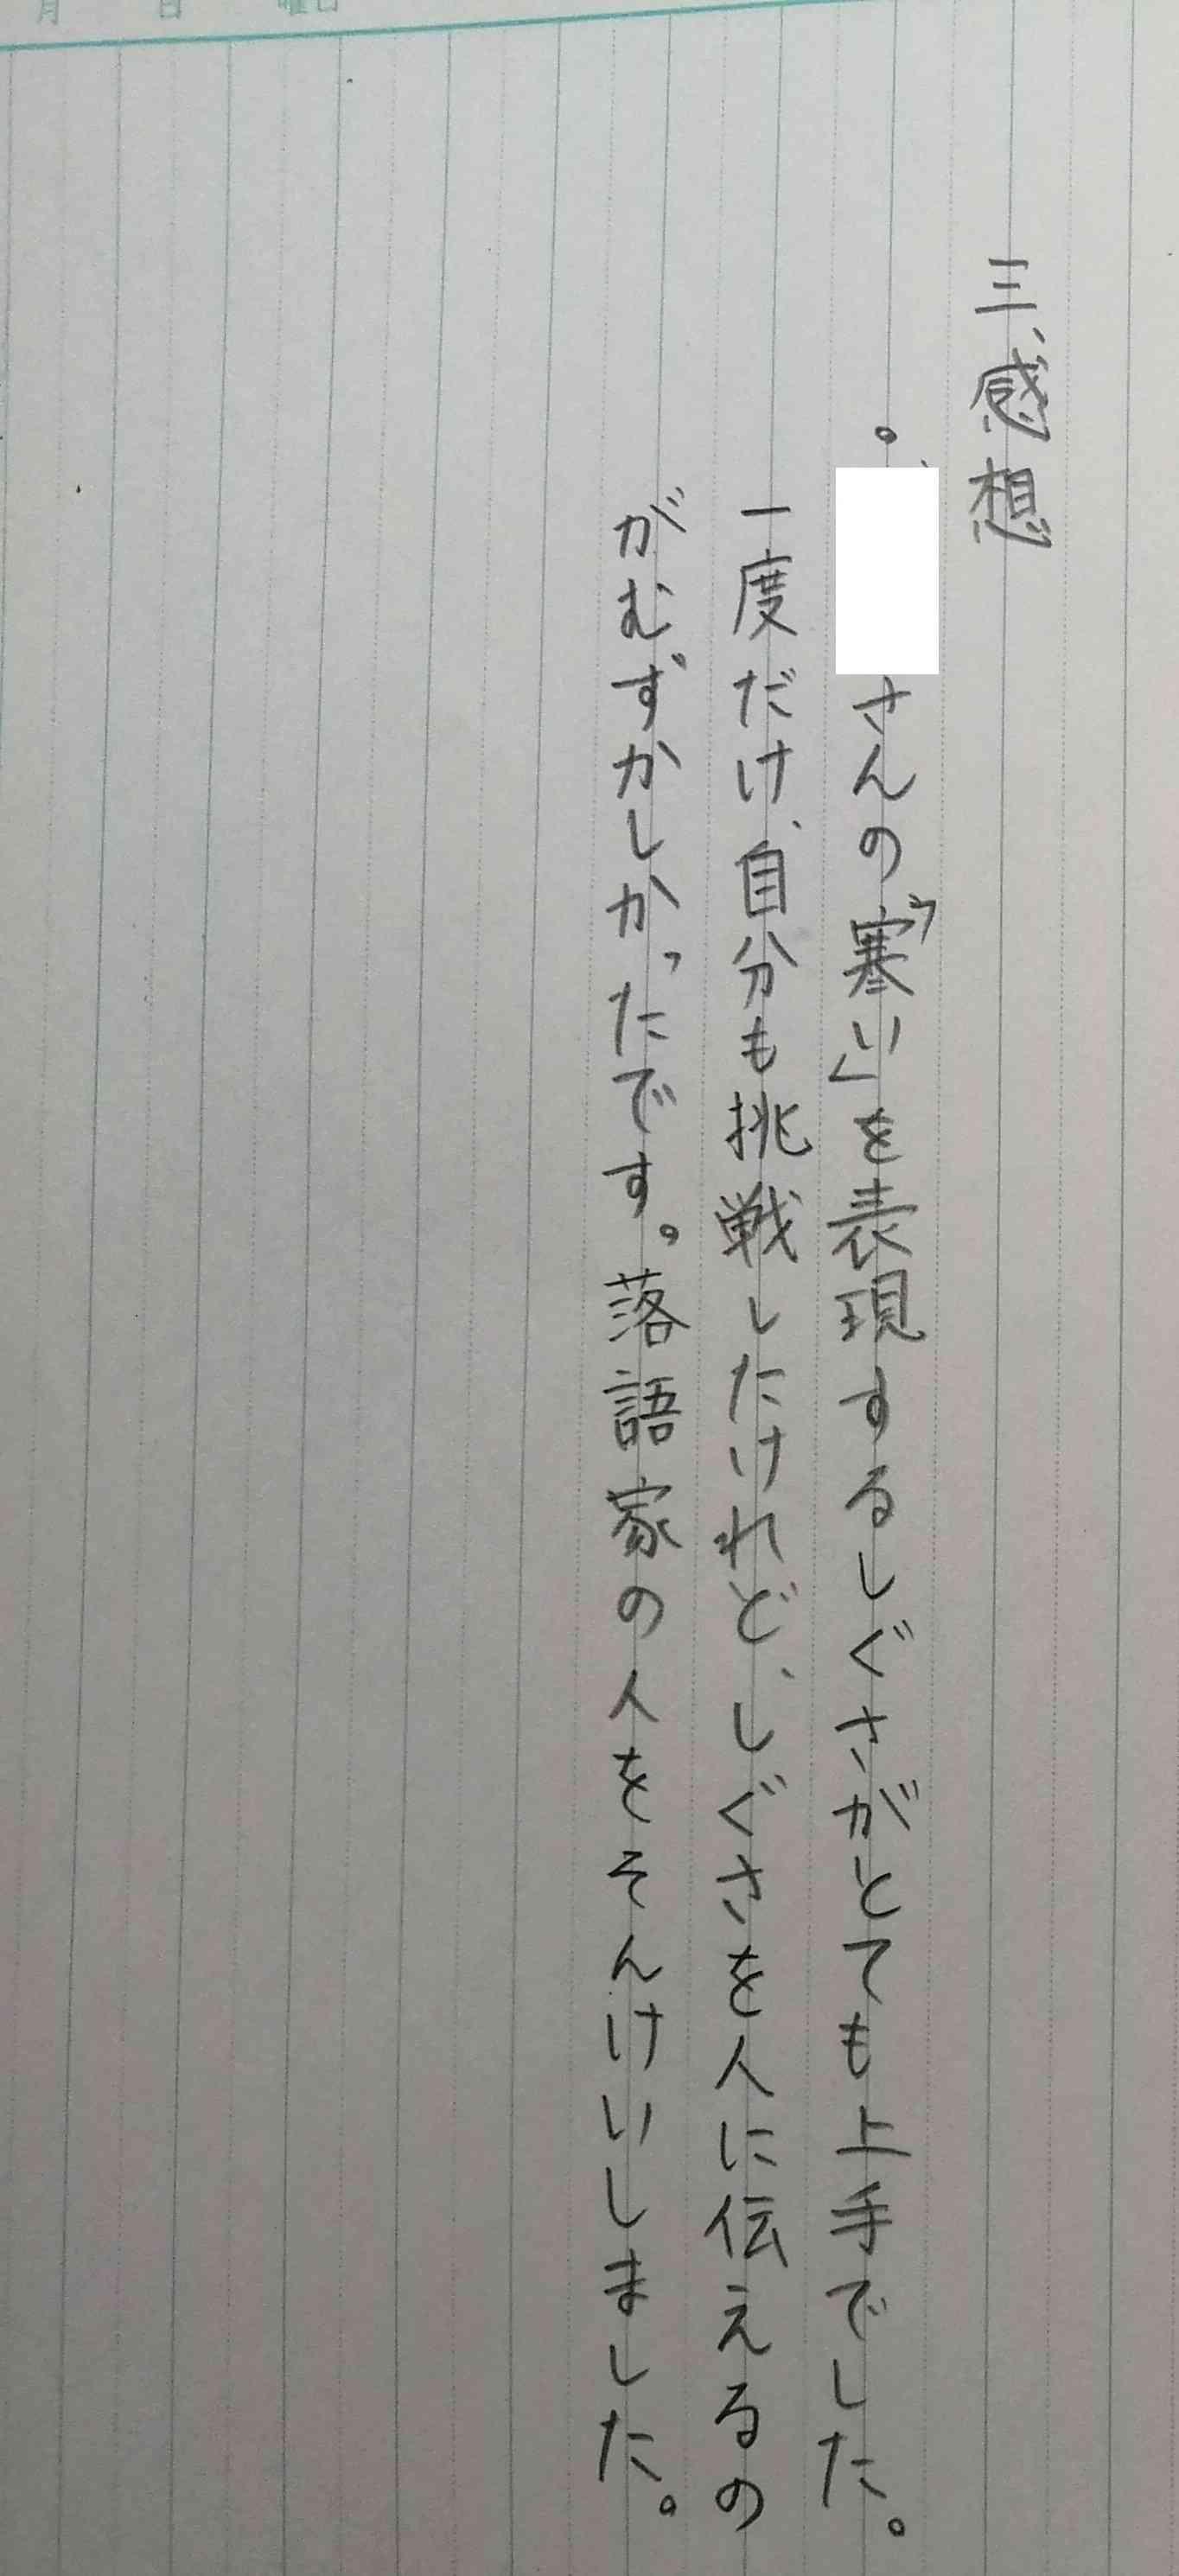 IMG_20210128_102157.jpg